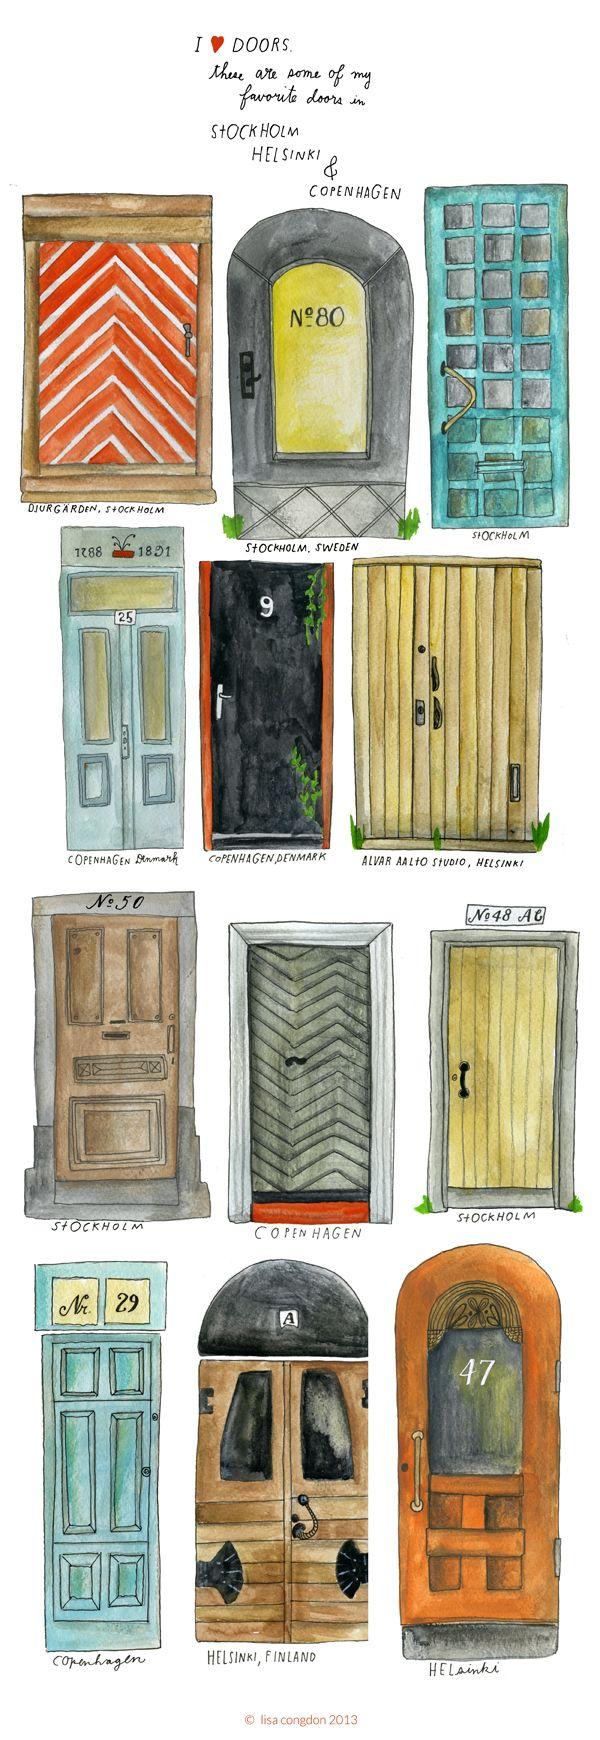 Nordic Door Illustrations by Lisa Congdon